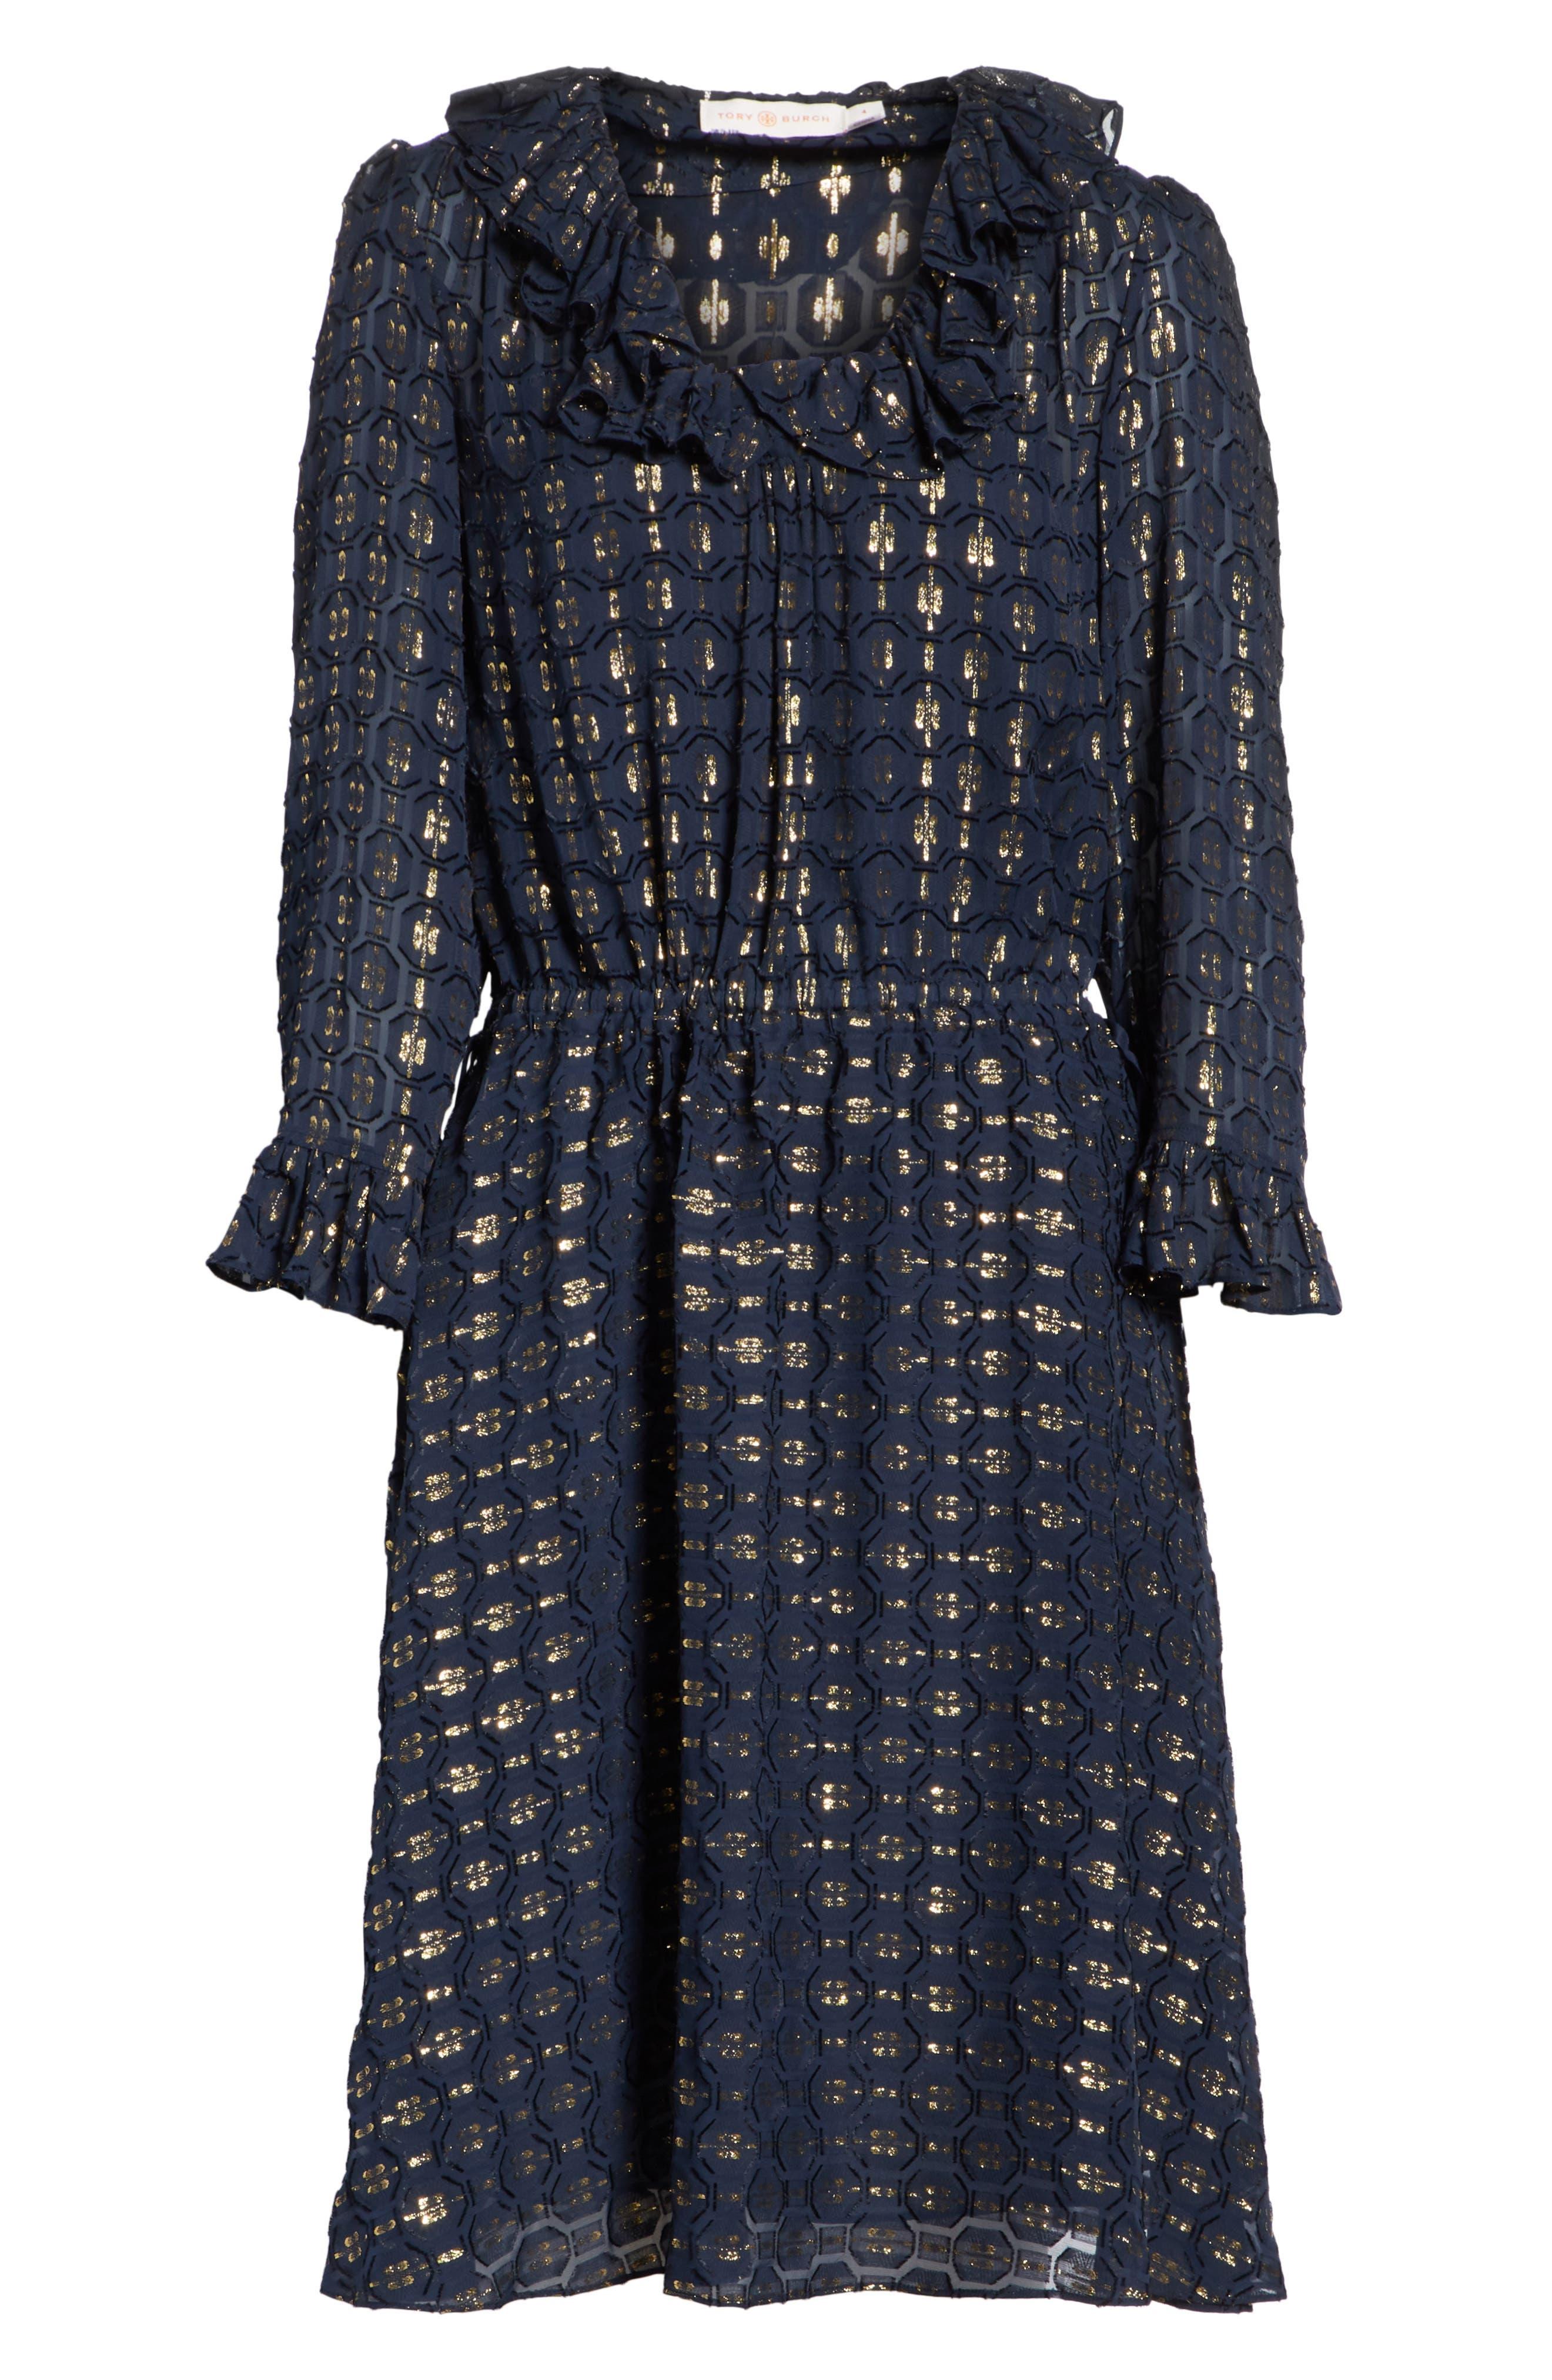 TORY BURCH,                             Jasmine Silk Blend Dress,                             Alternate thumbnail 6, color,                             405